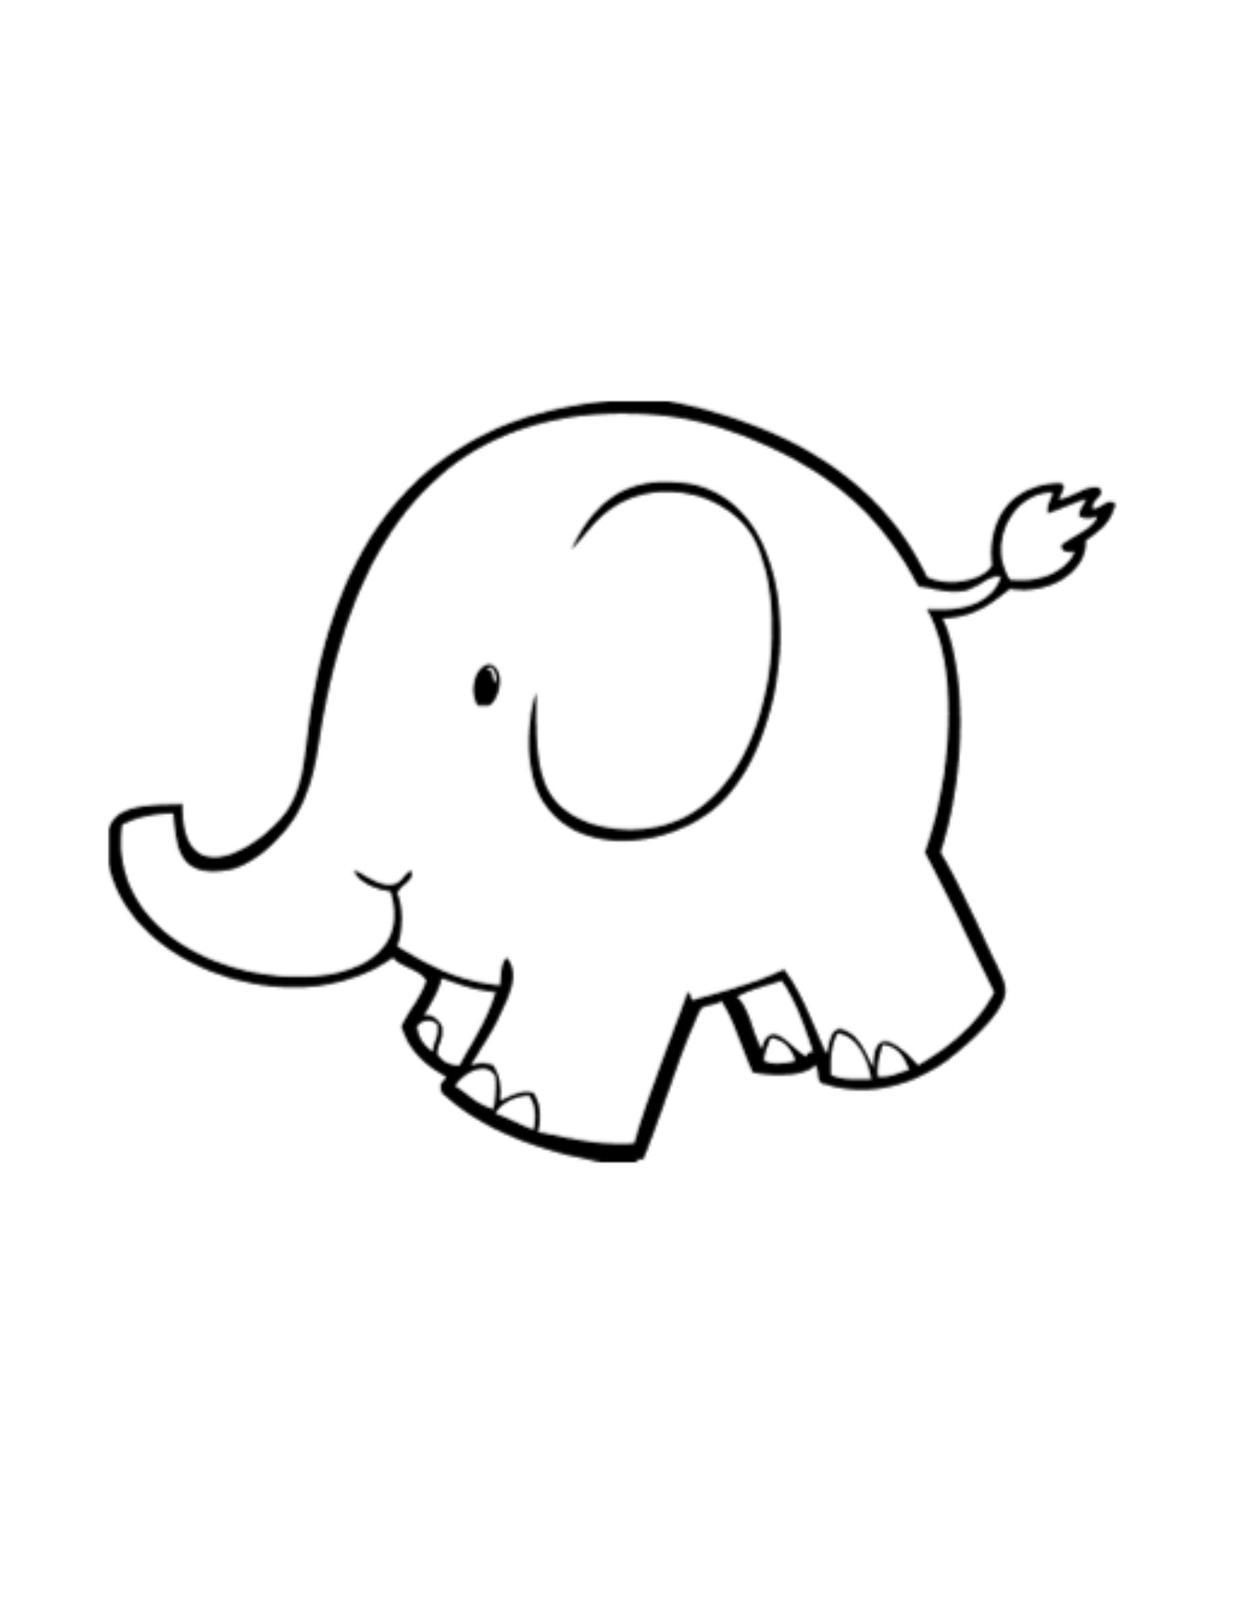 Baby Elephant Outline-Digital Download-ClipArt-Art Clip ...